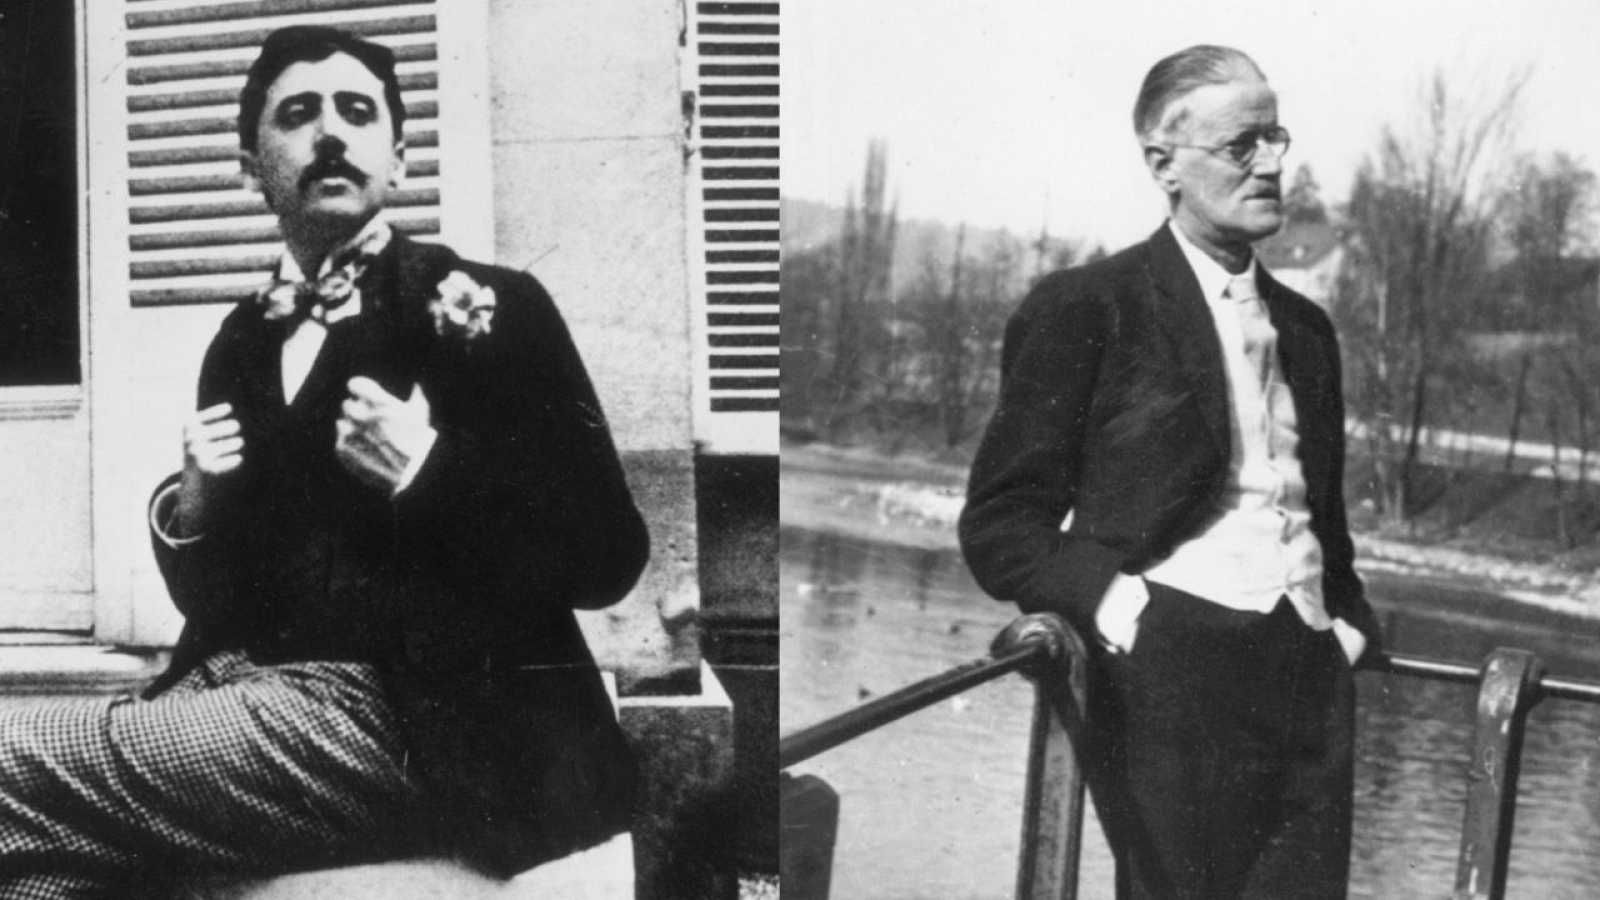 Relato sobre Marcel Proust y James Joyce - 14/01/20